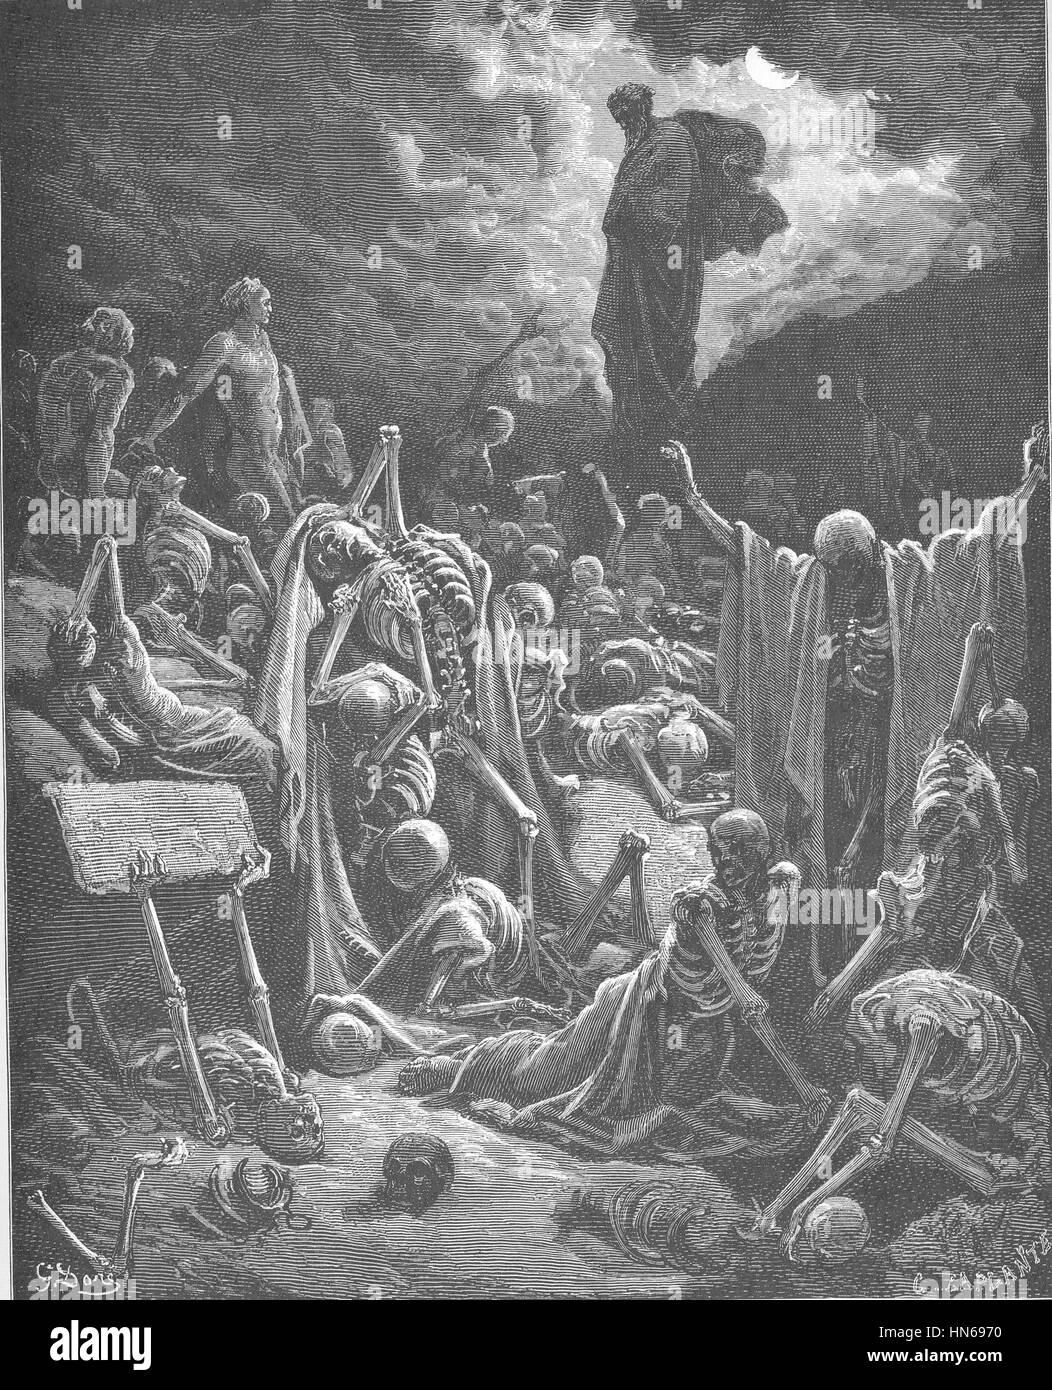 127.Ezekiel's Vision of the Valley of Dry Bones - Stock Image